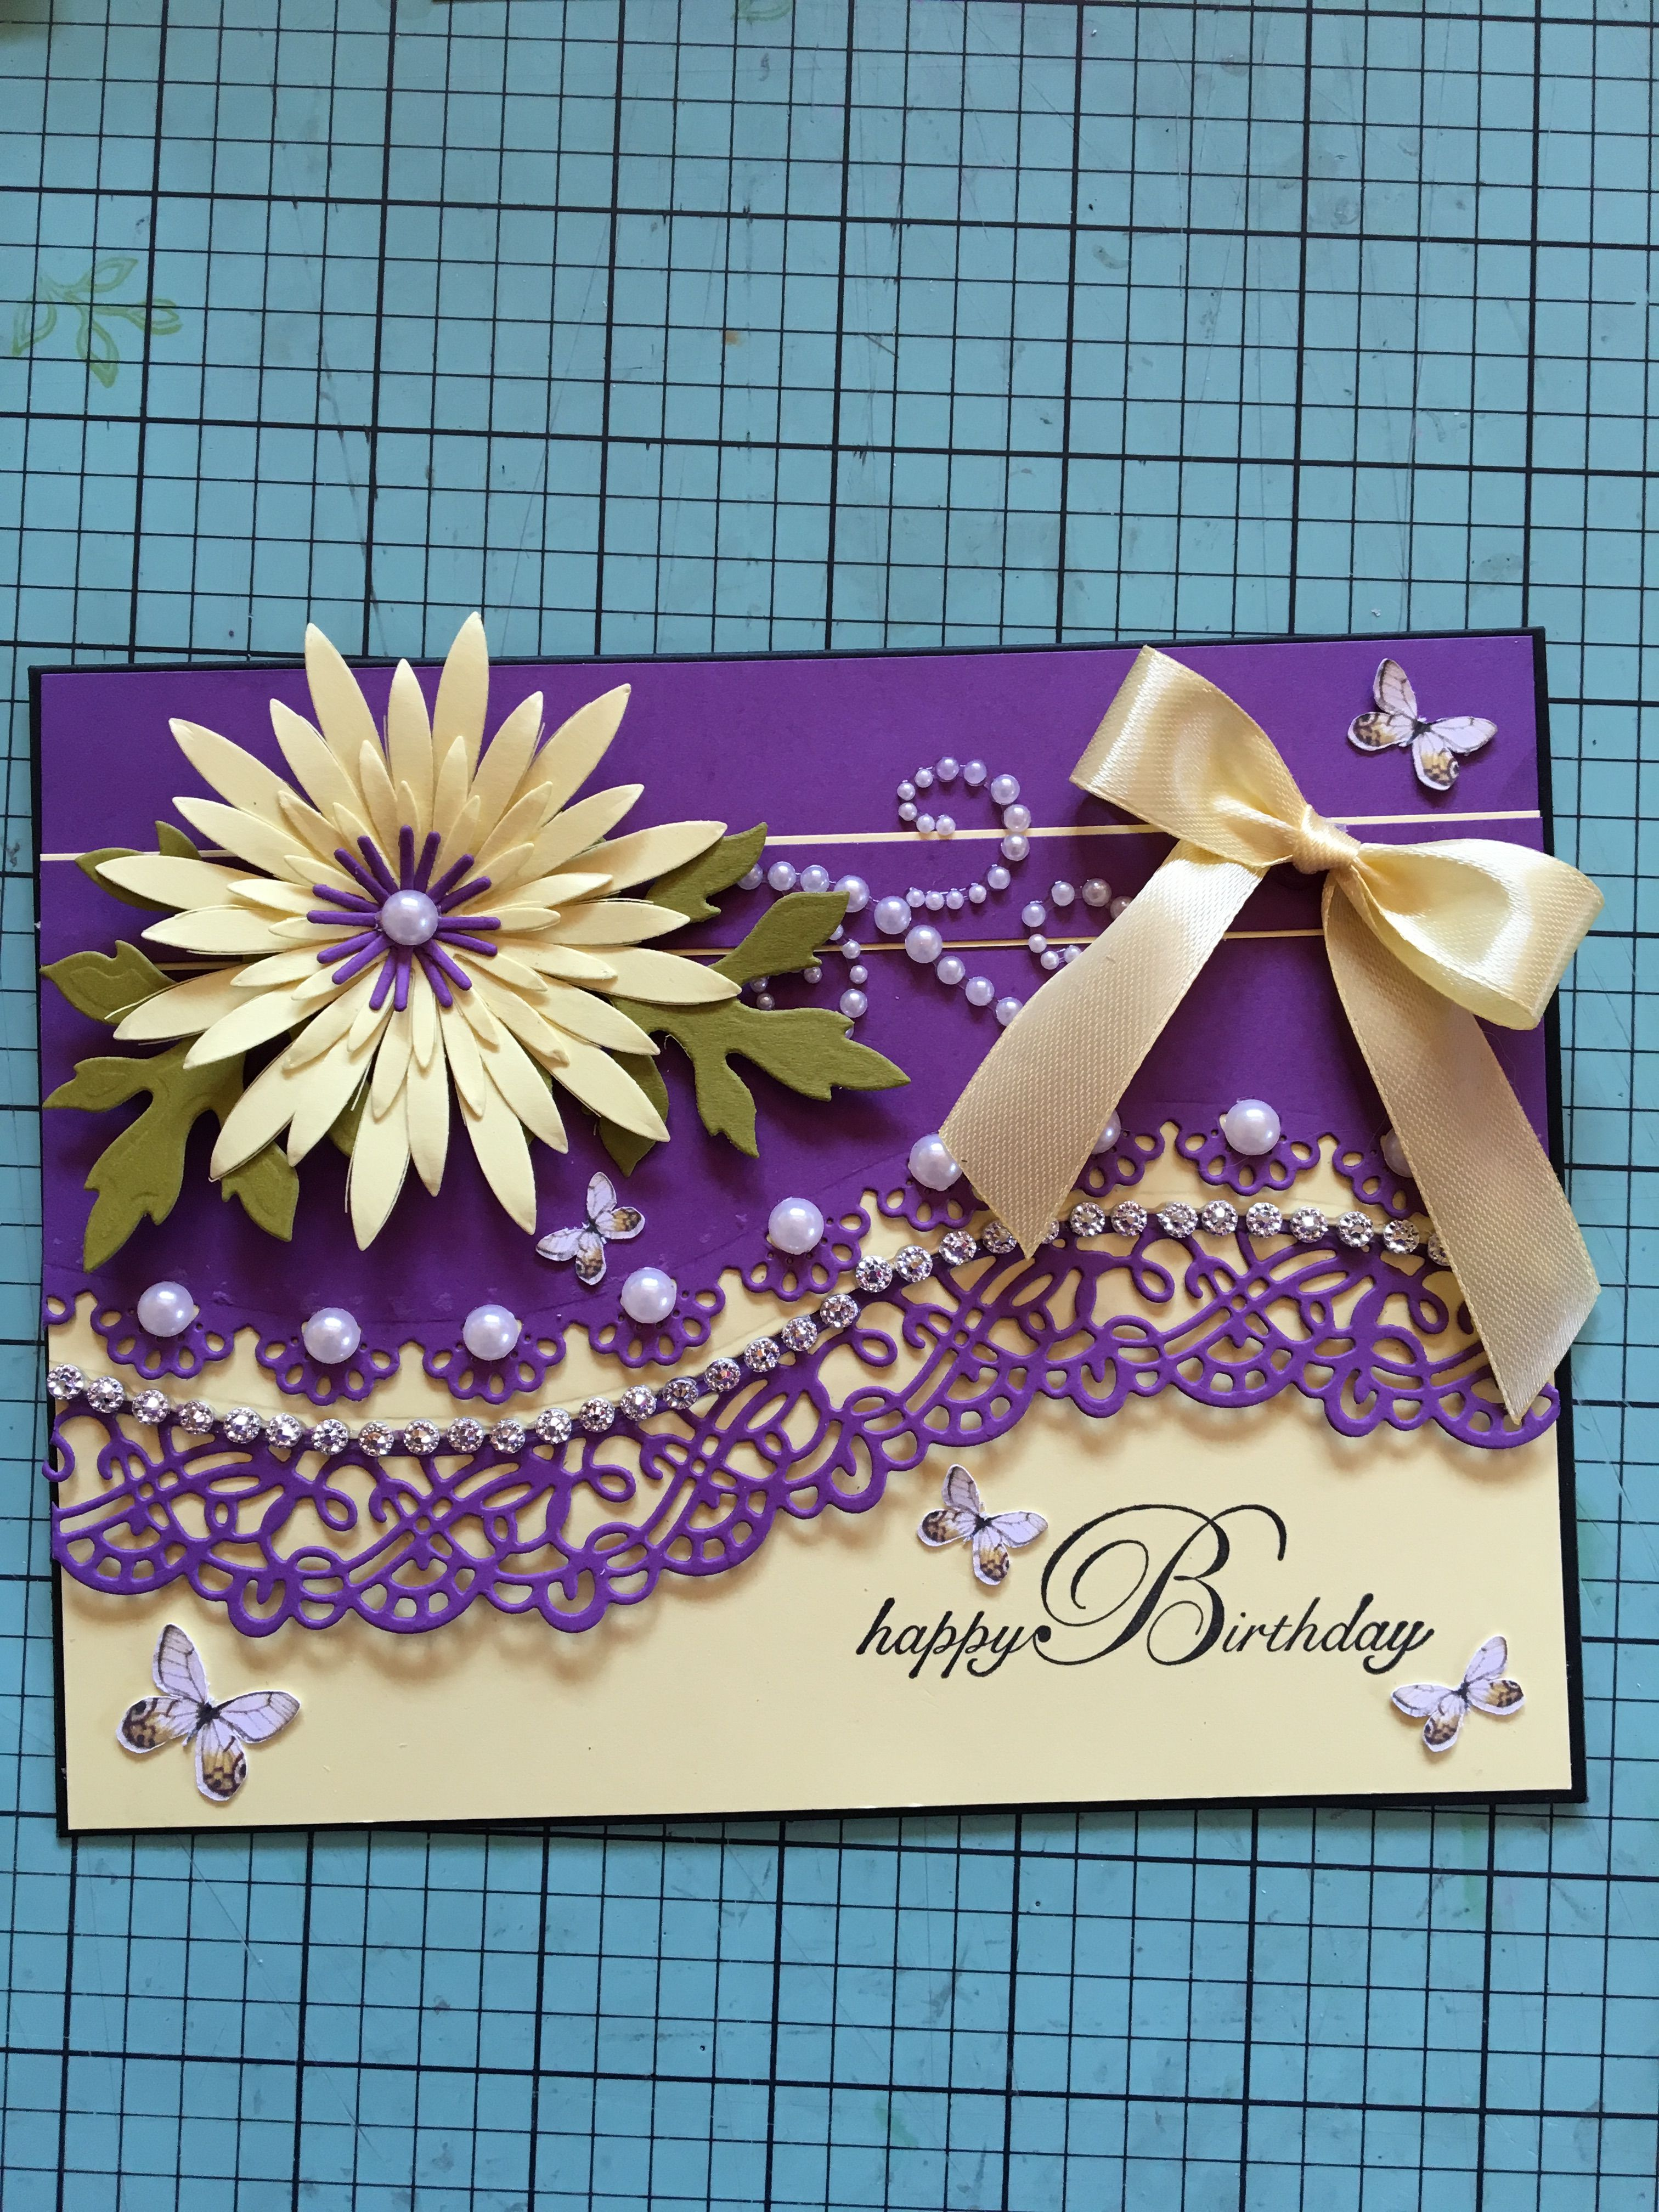 Happy birthday card cards pinterest cards happy birthday